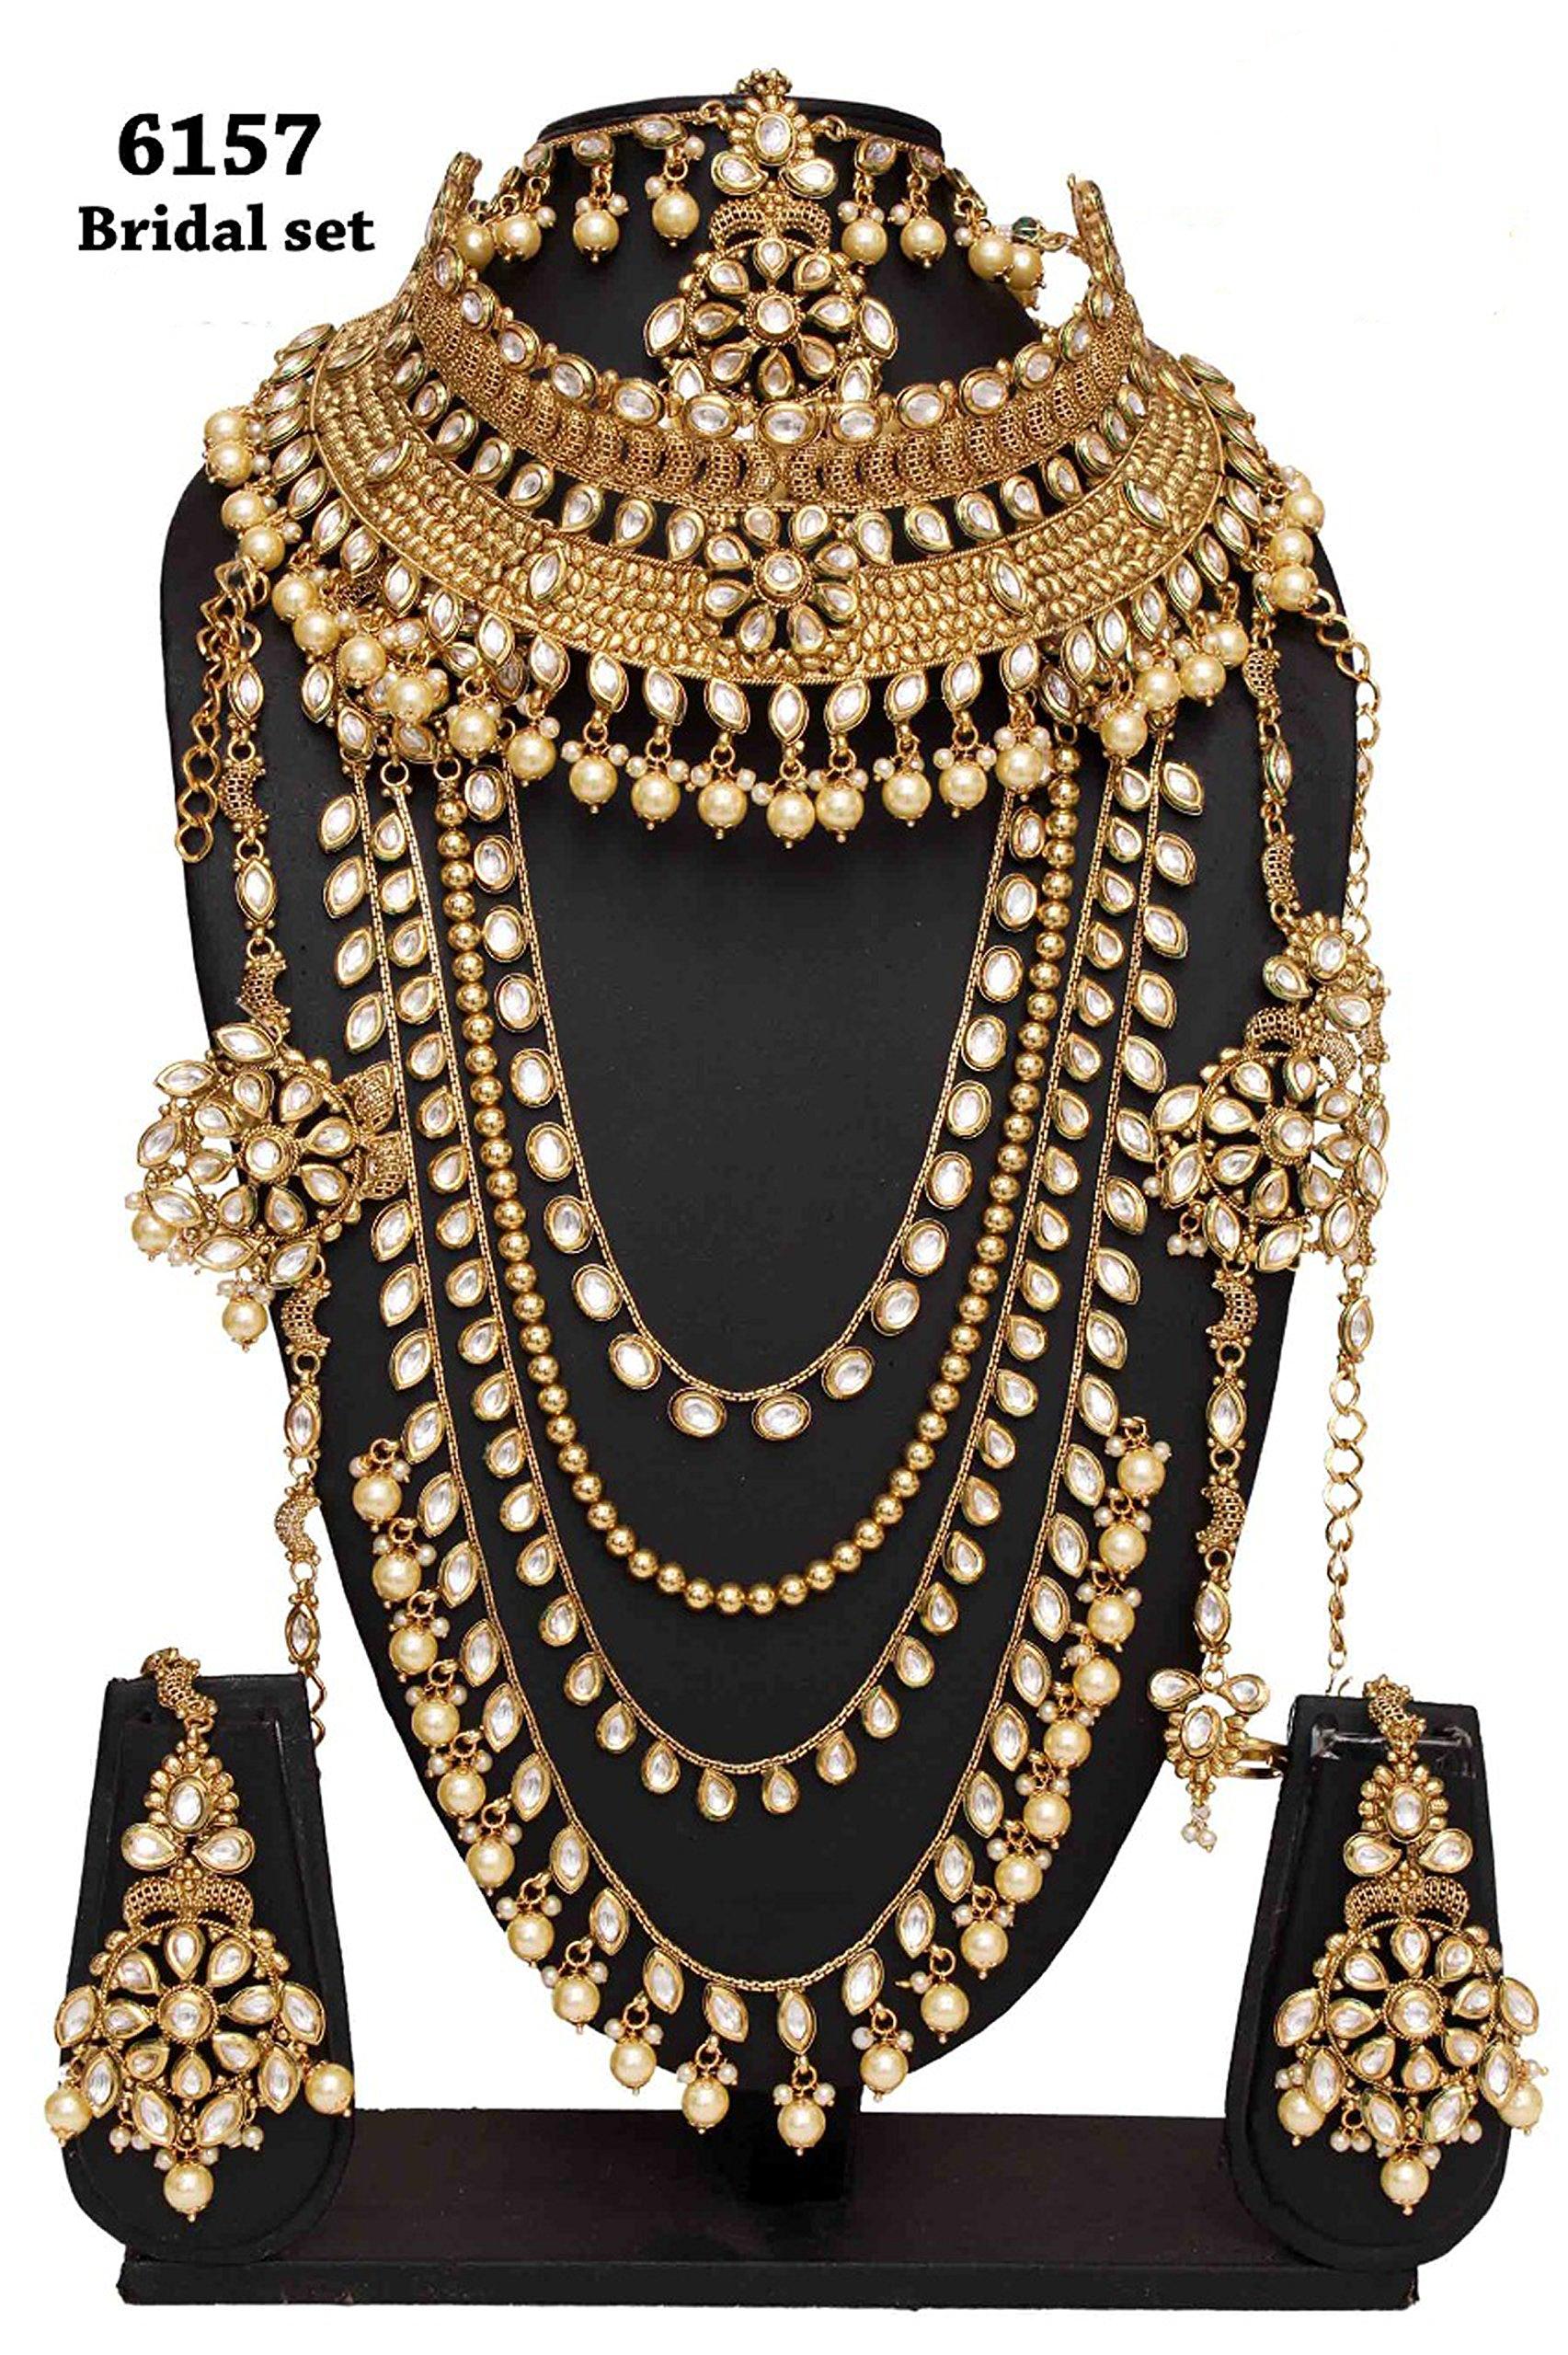 Bollywood Fashion Style Golden Plated Kundan Stone Polki Indian Necklace Earrings Bridal Set Jewelry